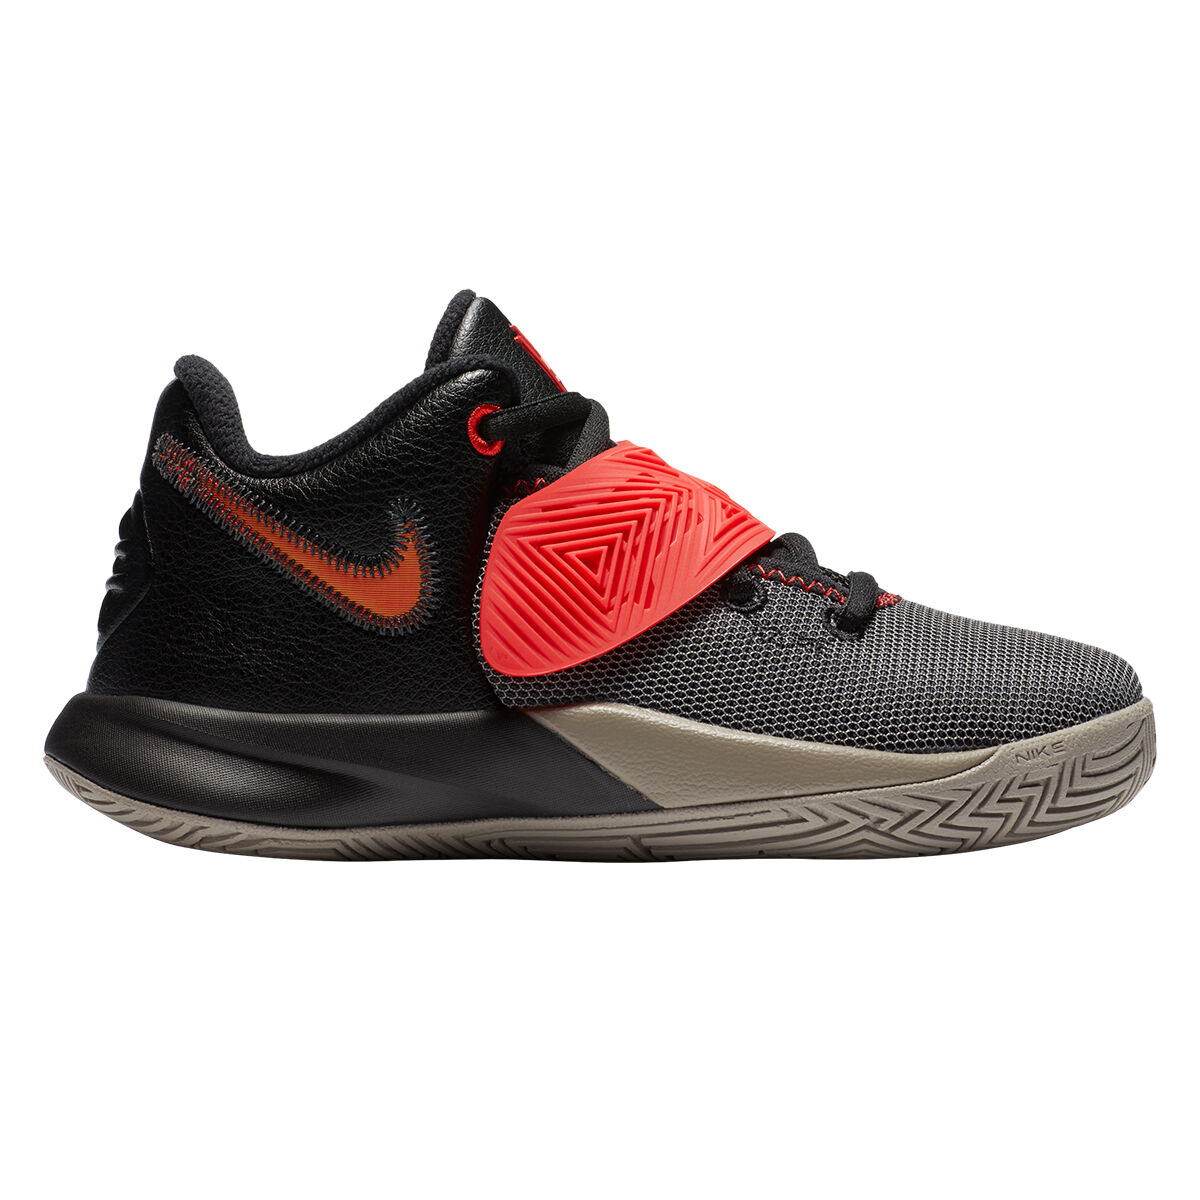 Nike Kyrie Flytrap III Kids Basketball